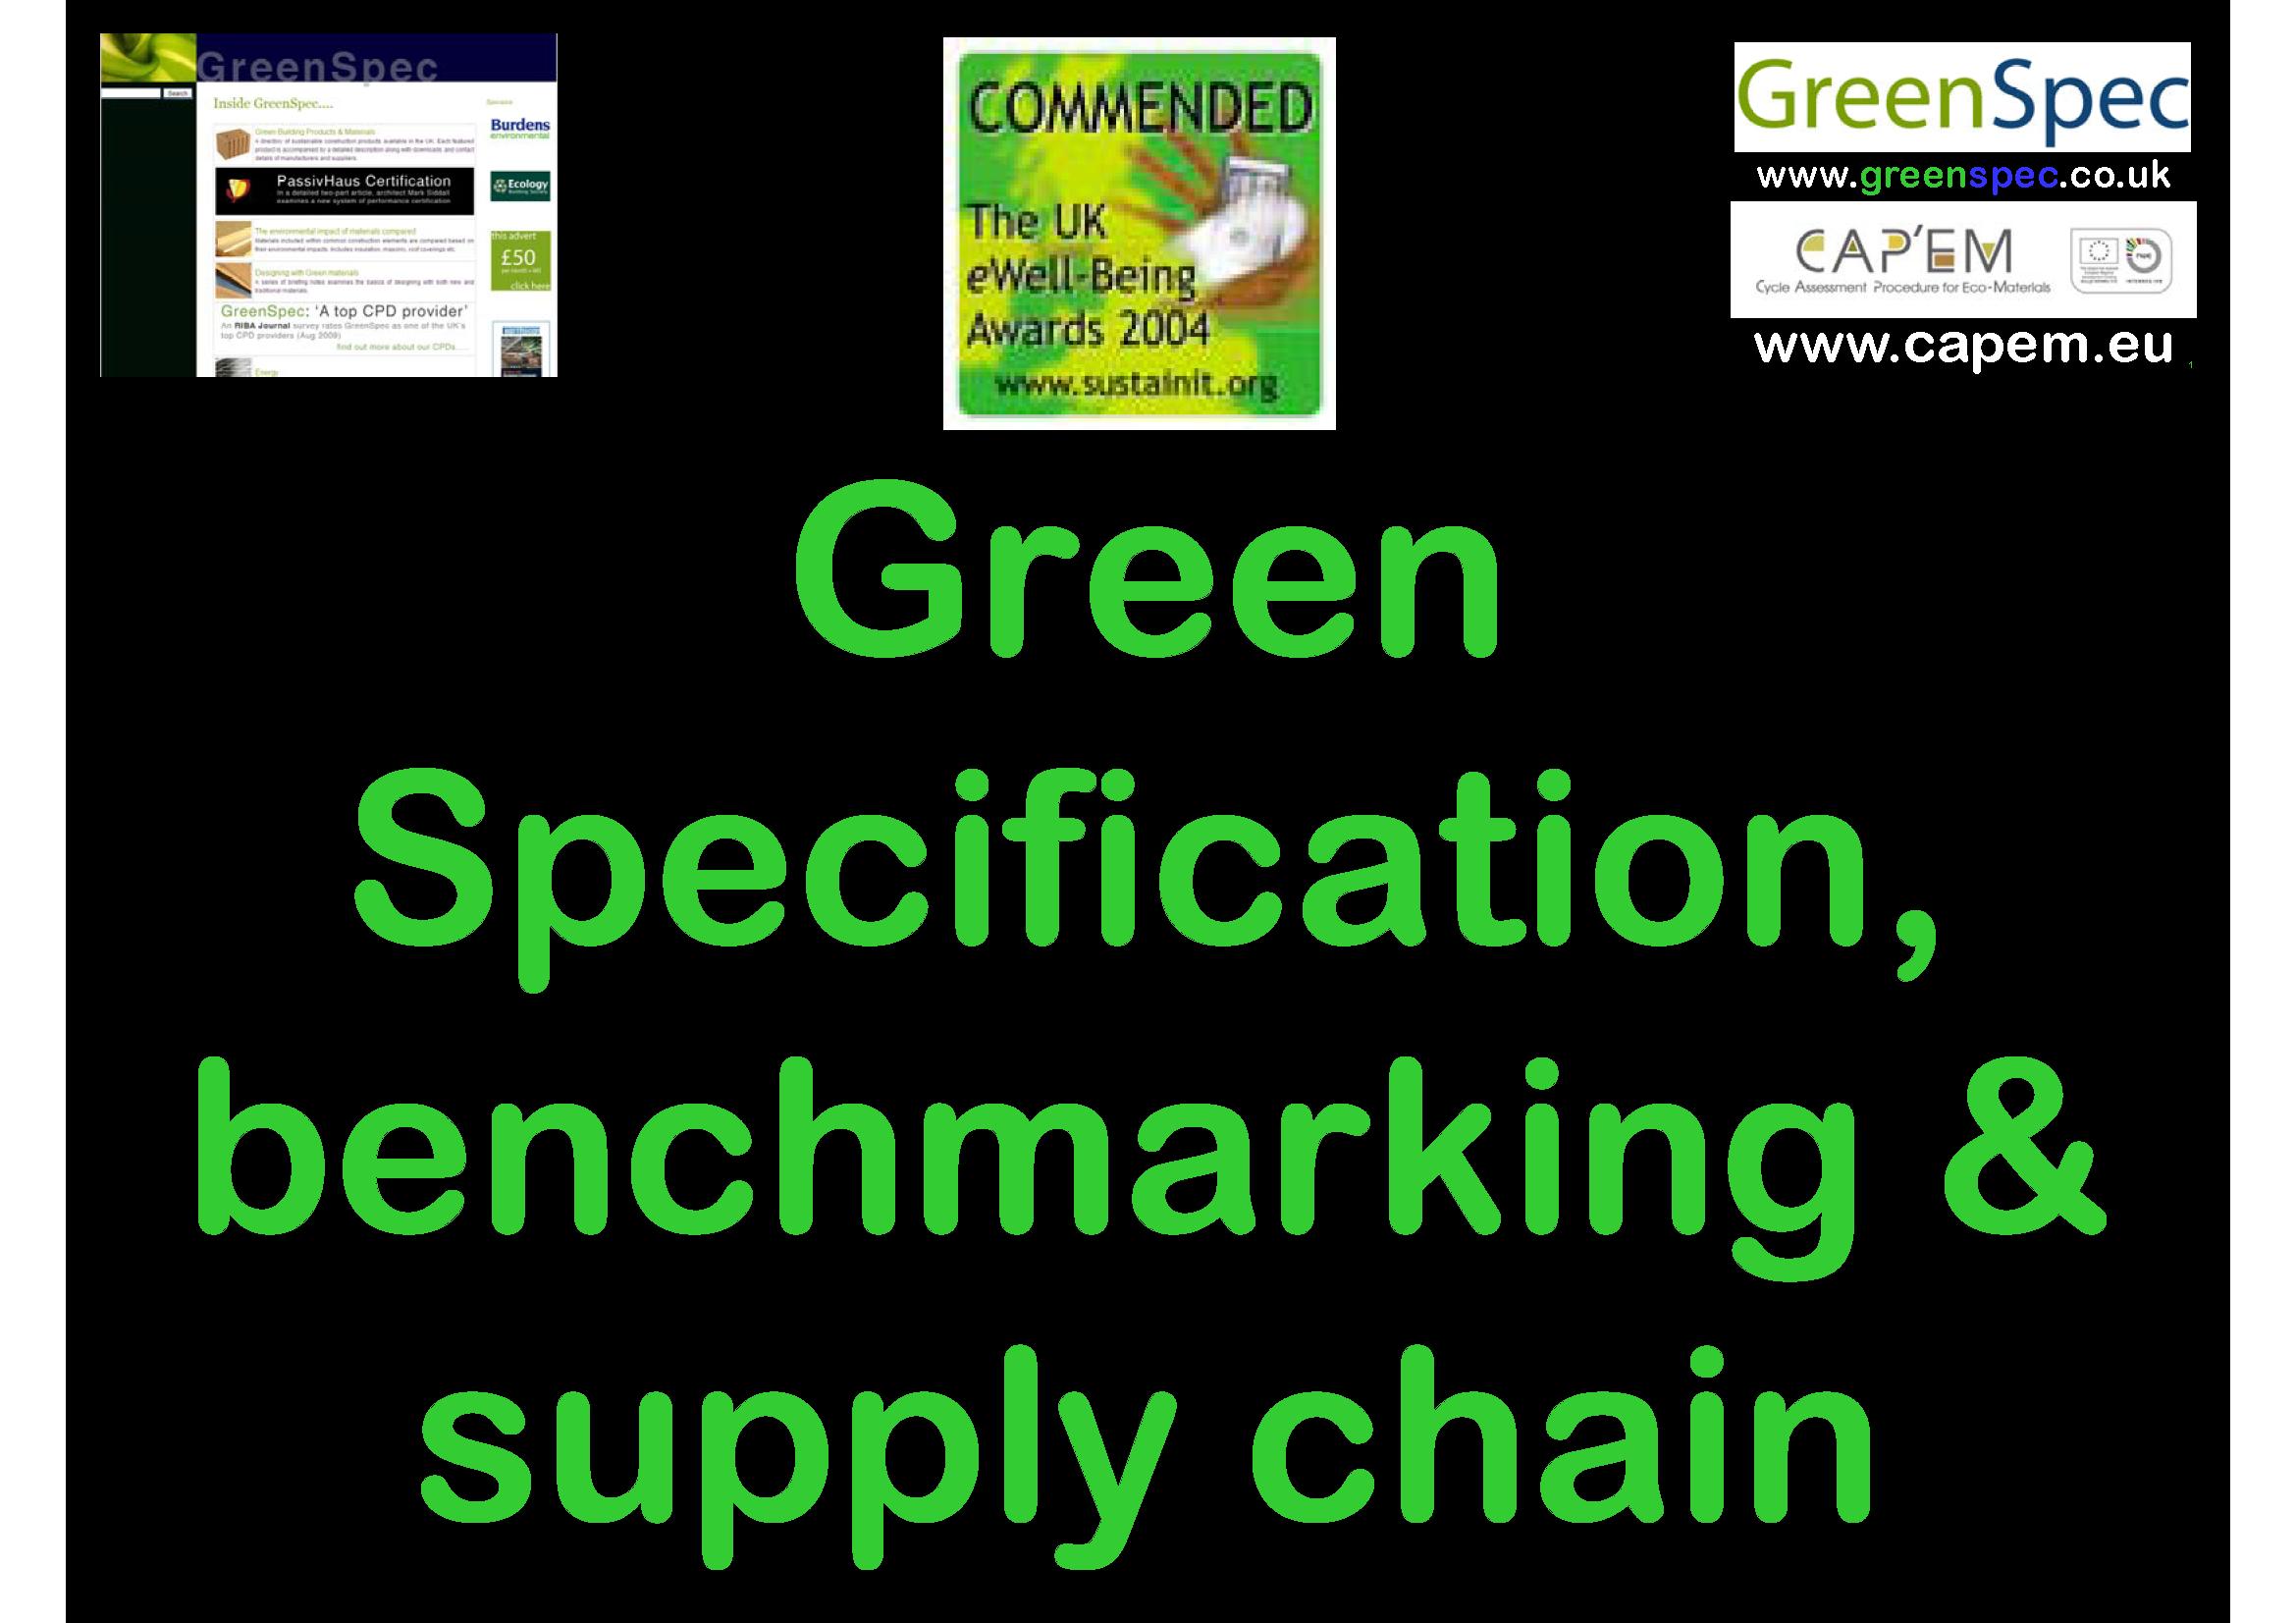 SpecificationBenchmarkingSupplyChain.png